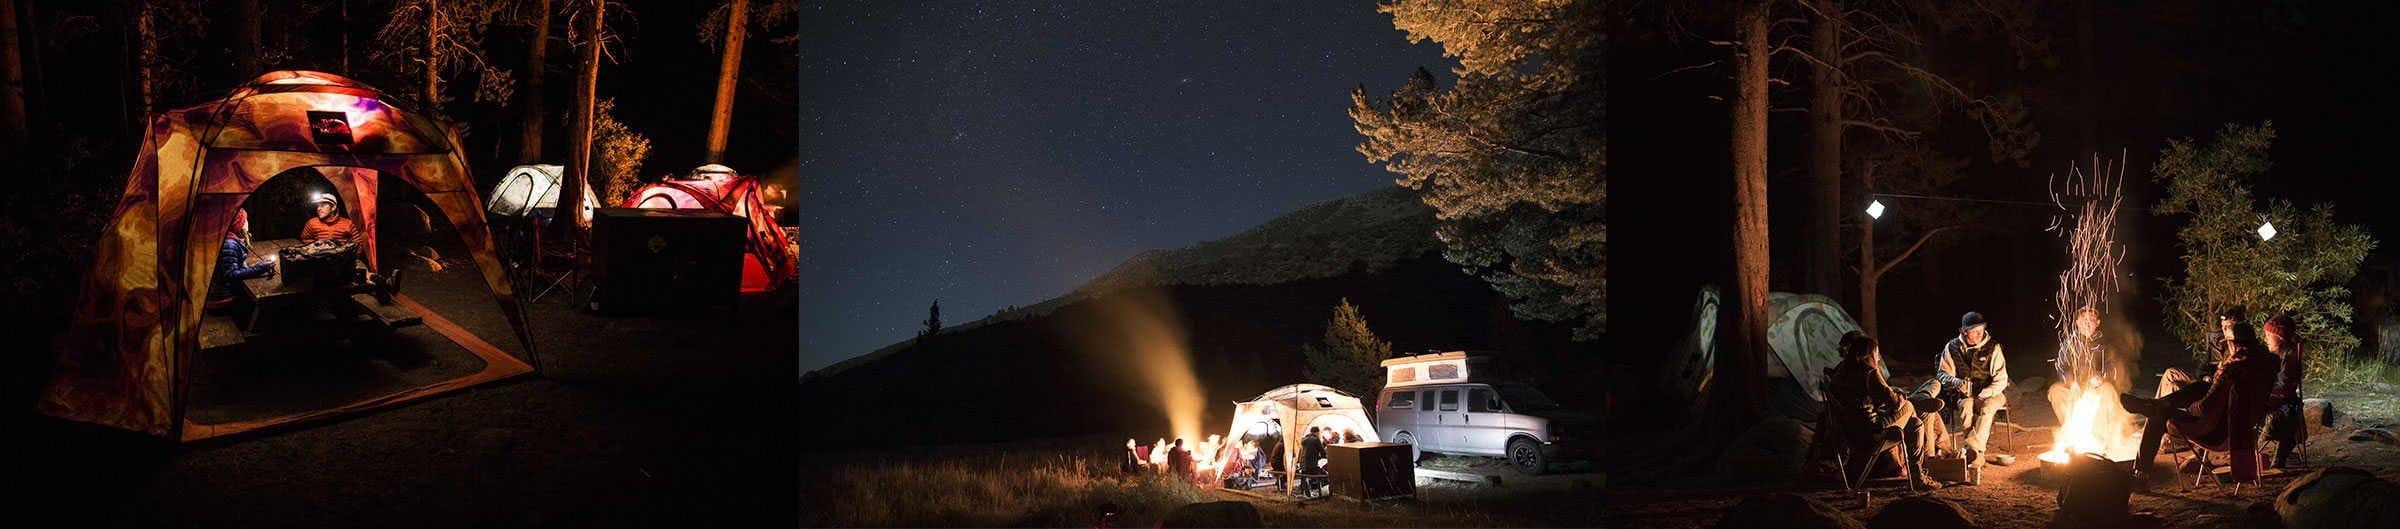 camping avec la collection homestead de TNF